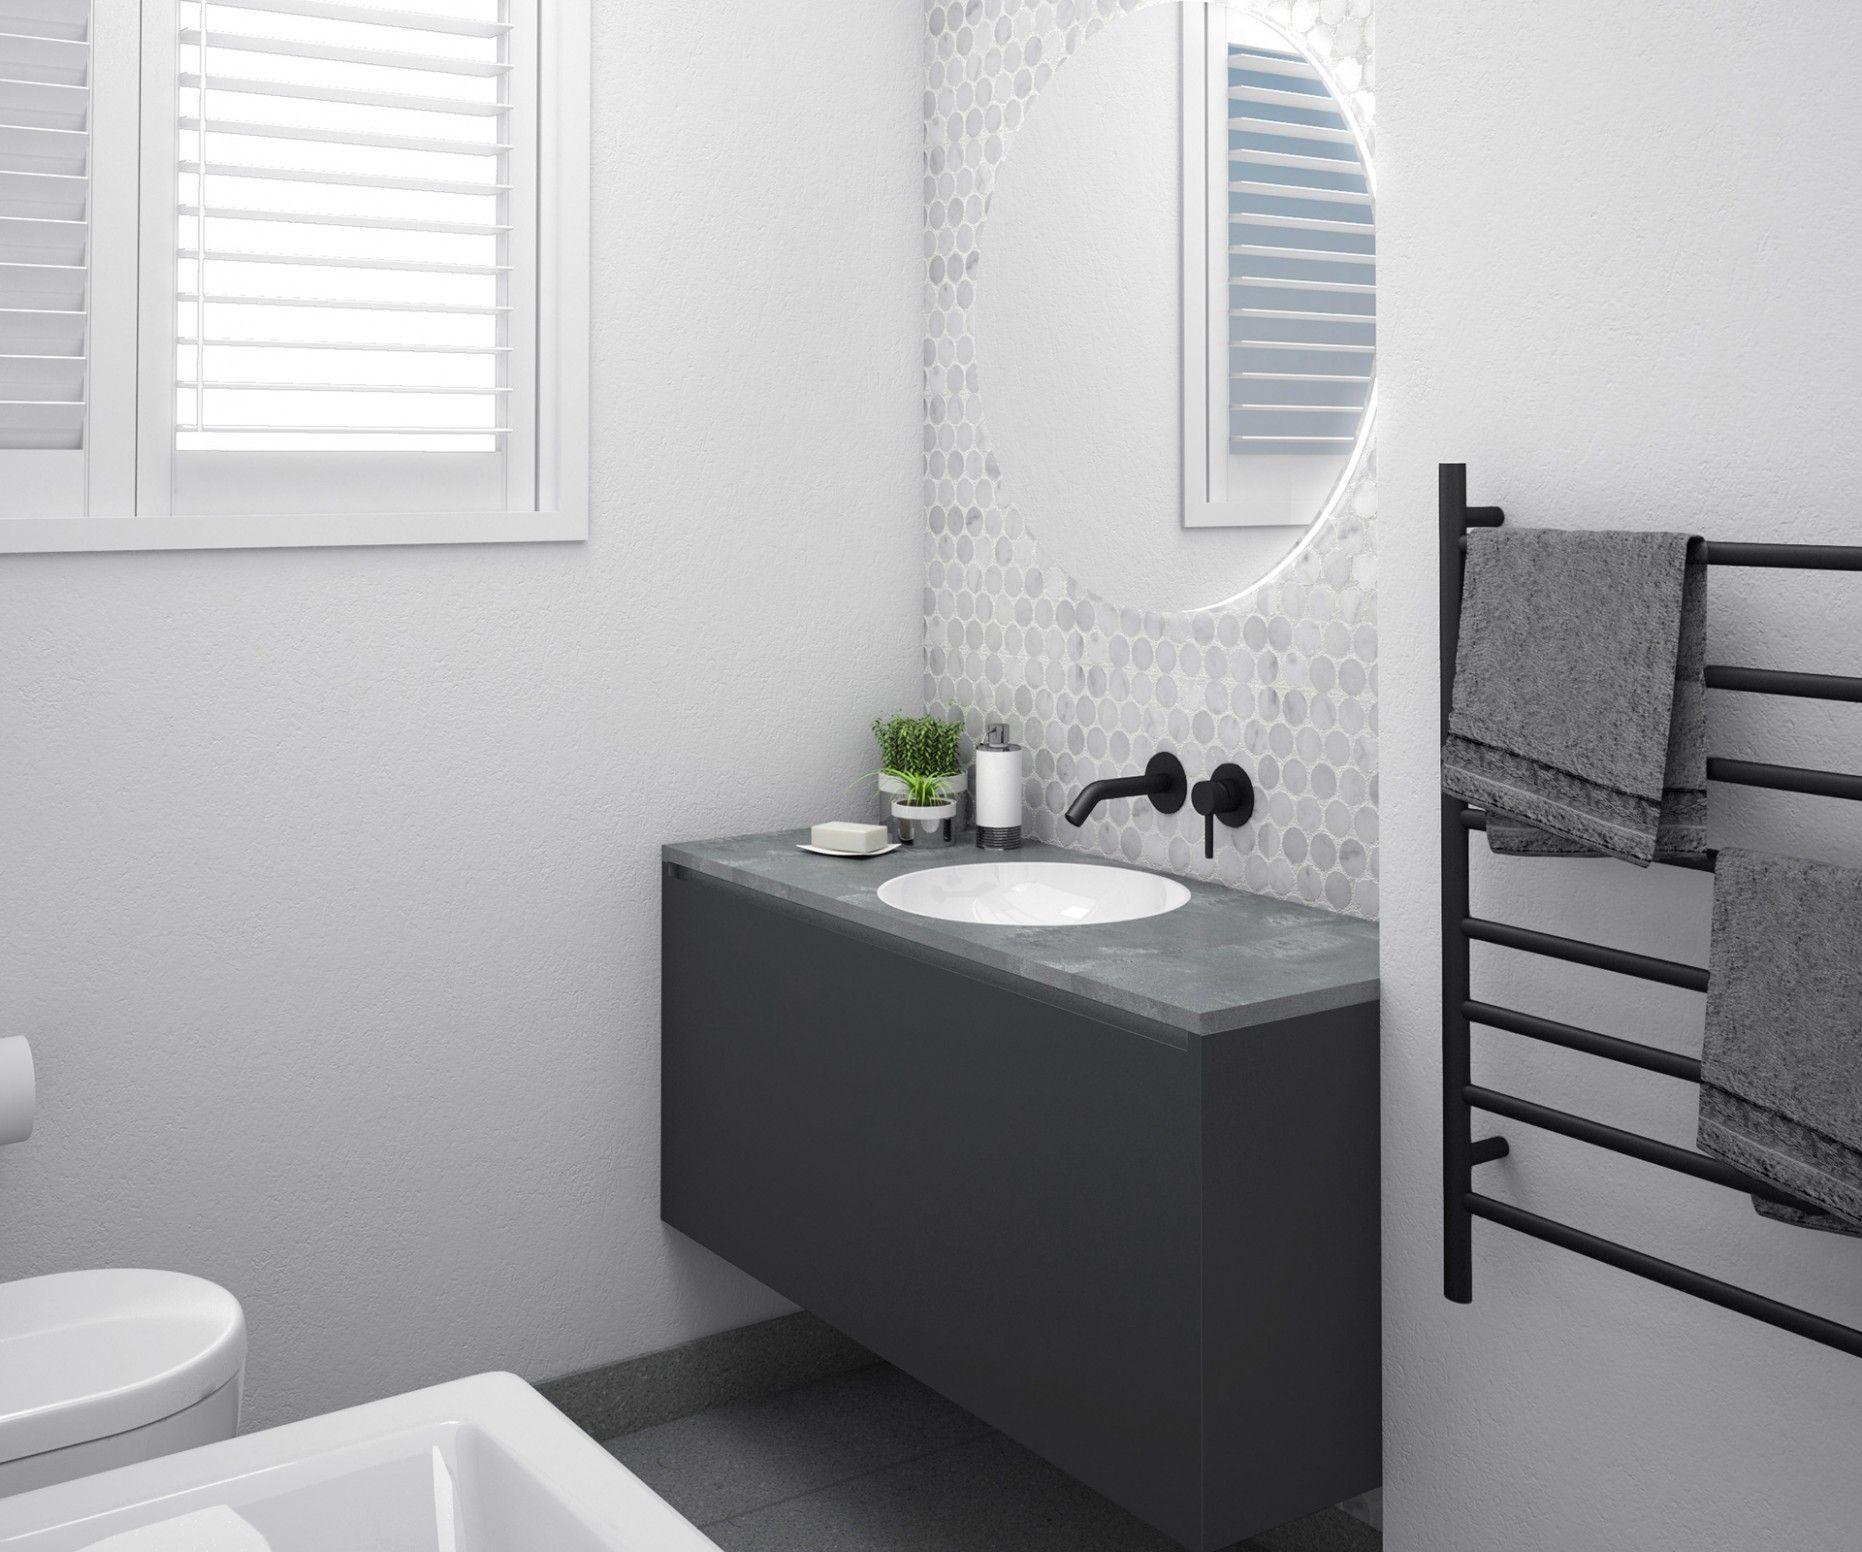 Family Bathroom Ideas Video di 2020